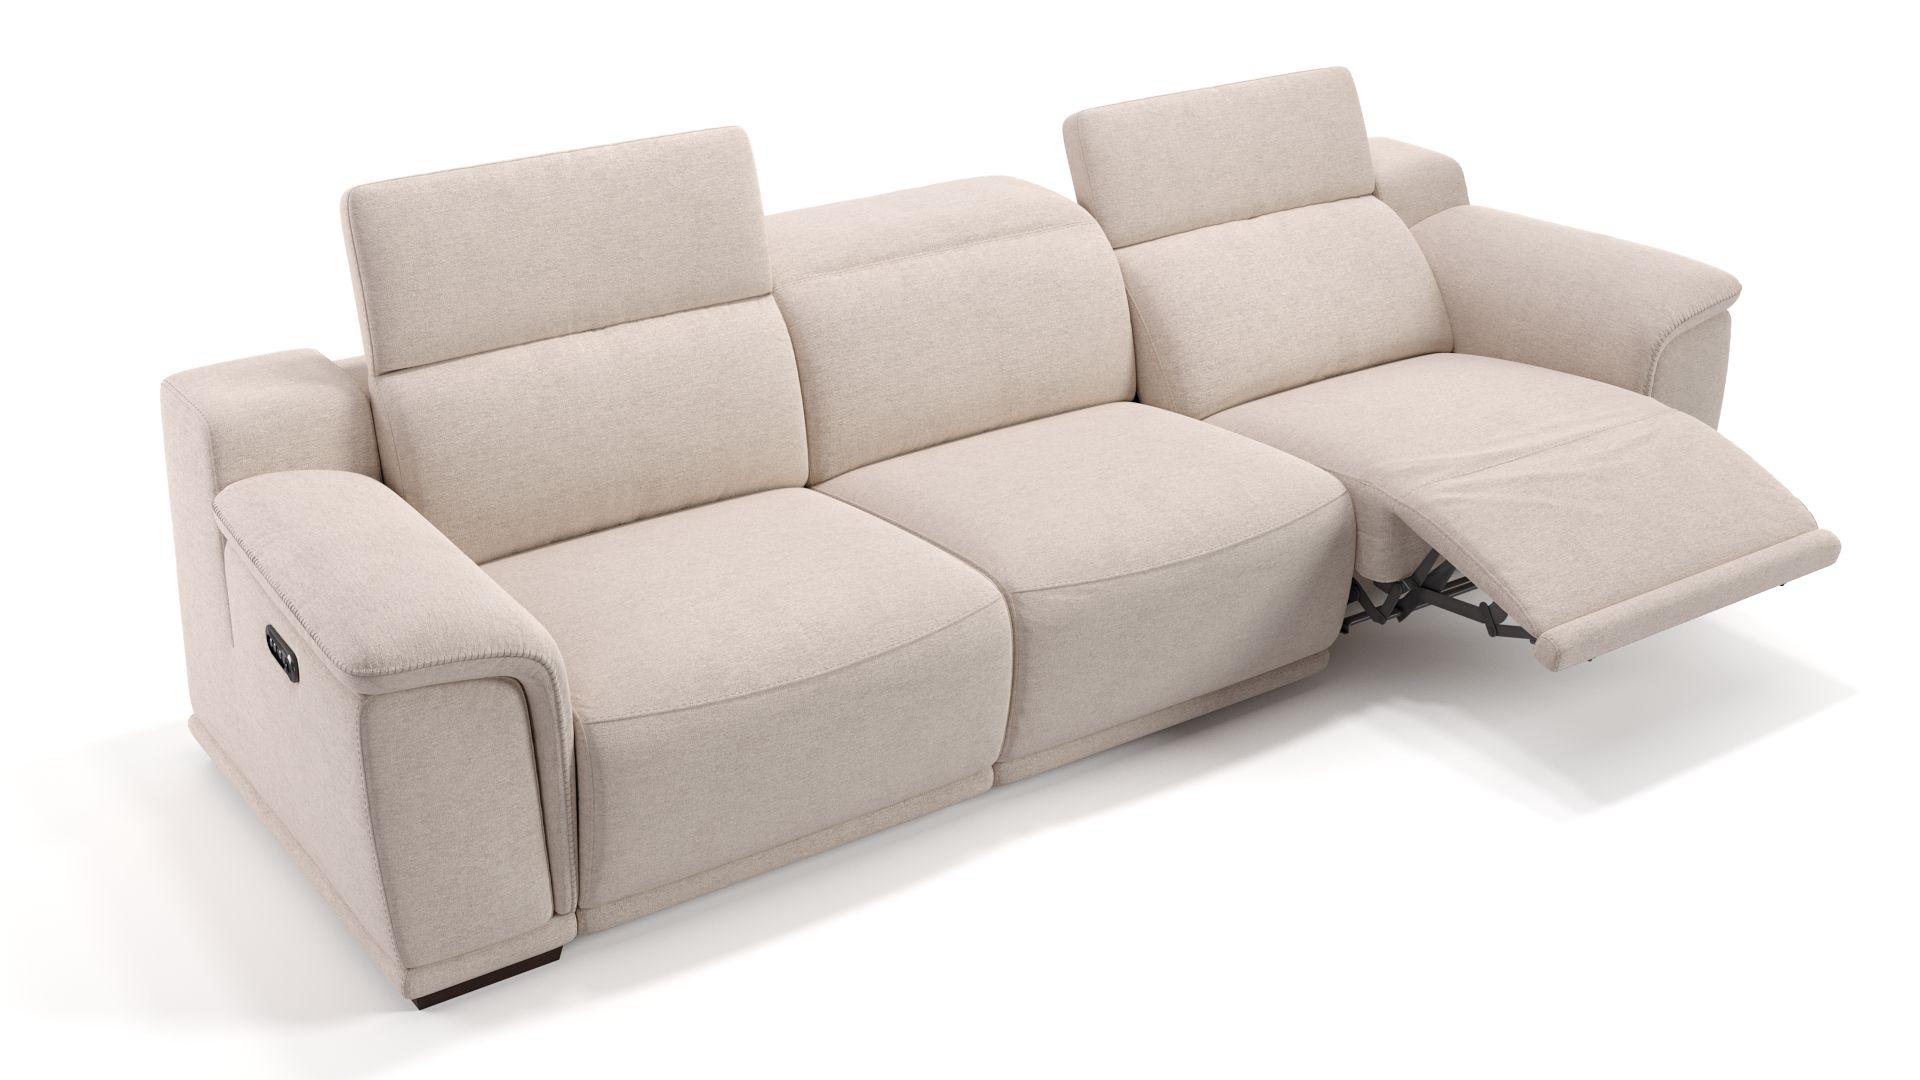 XXL Sofa mit Funktion | Megasofa Montefino | Sofanella